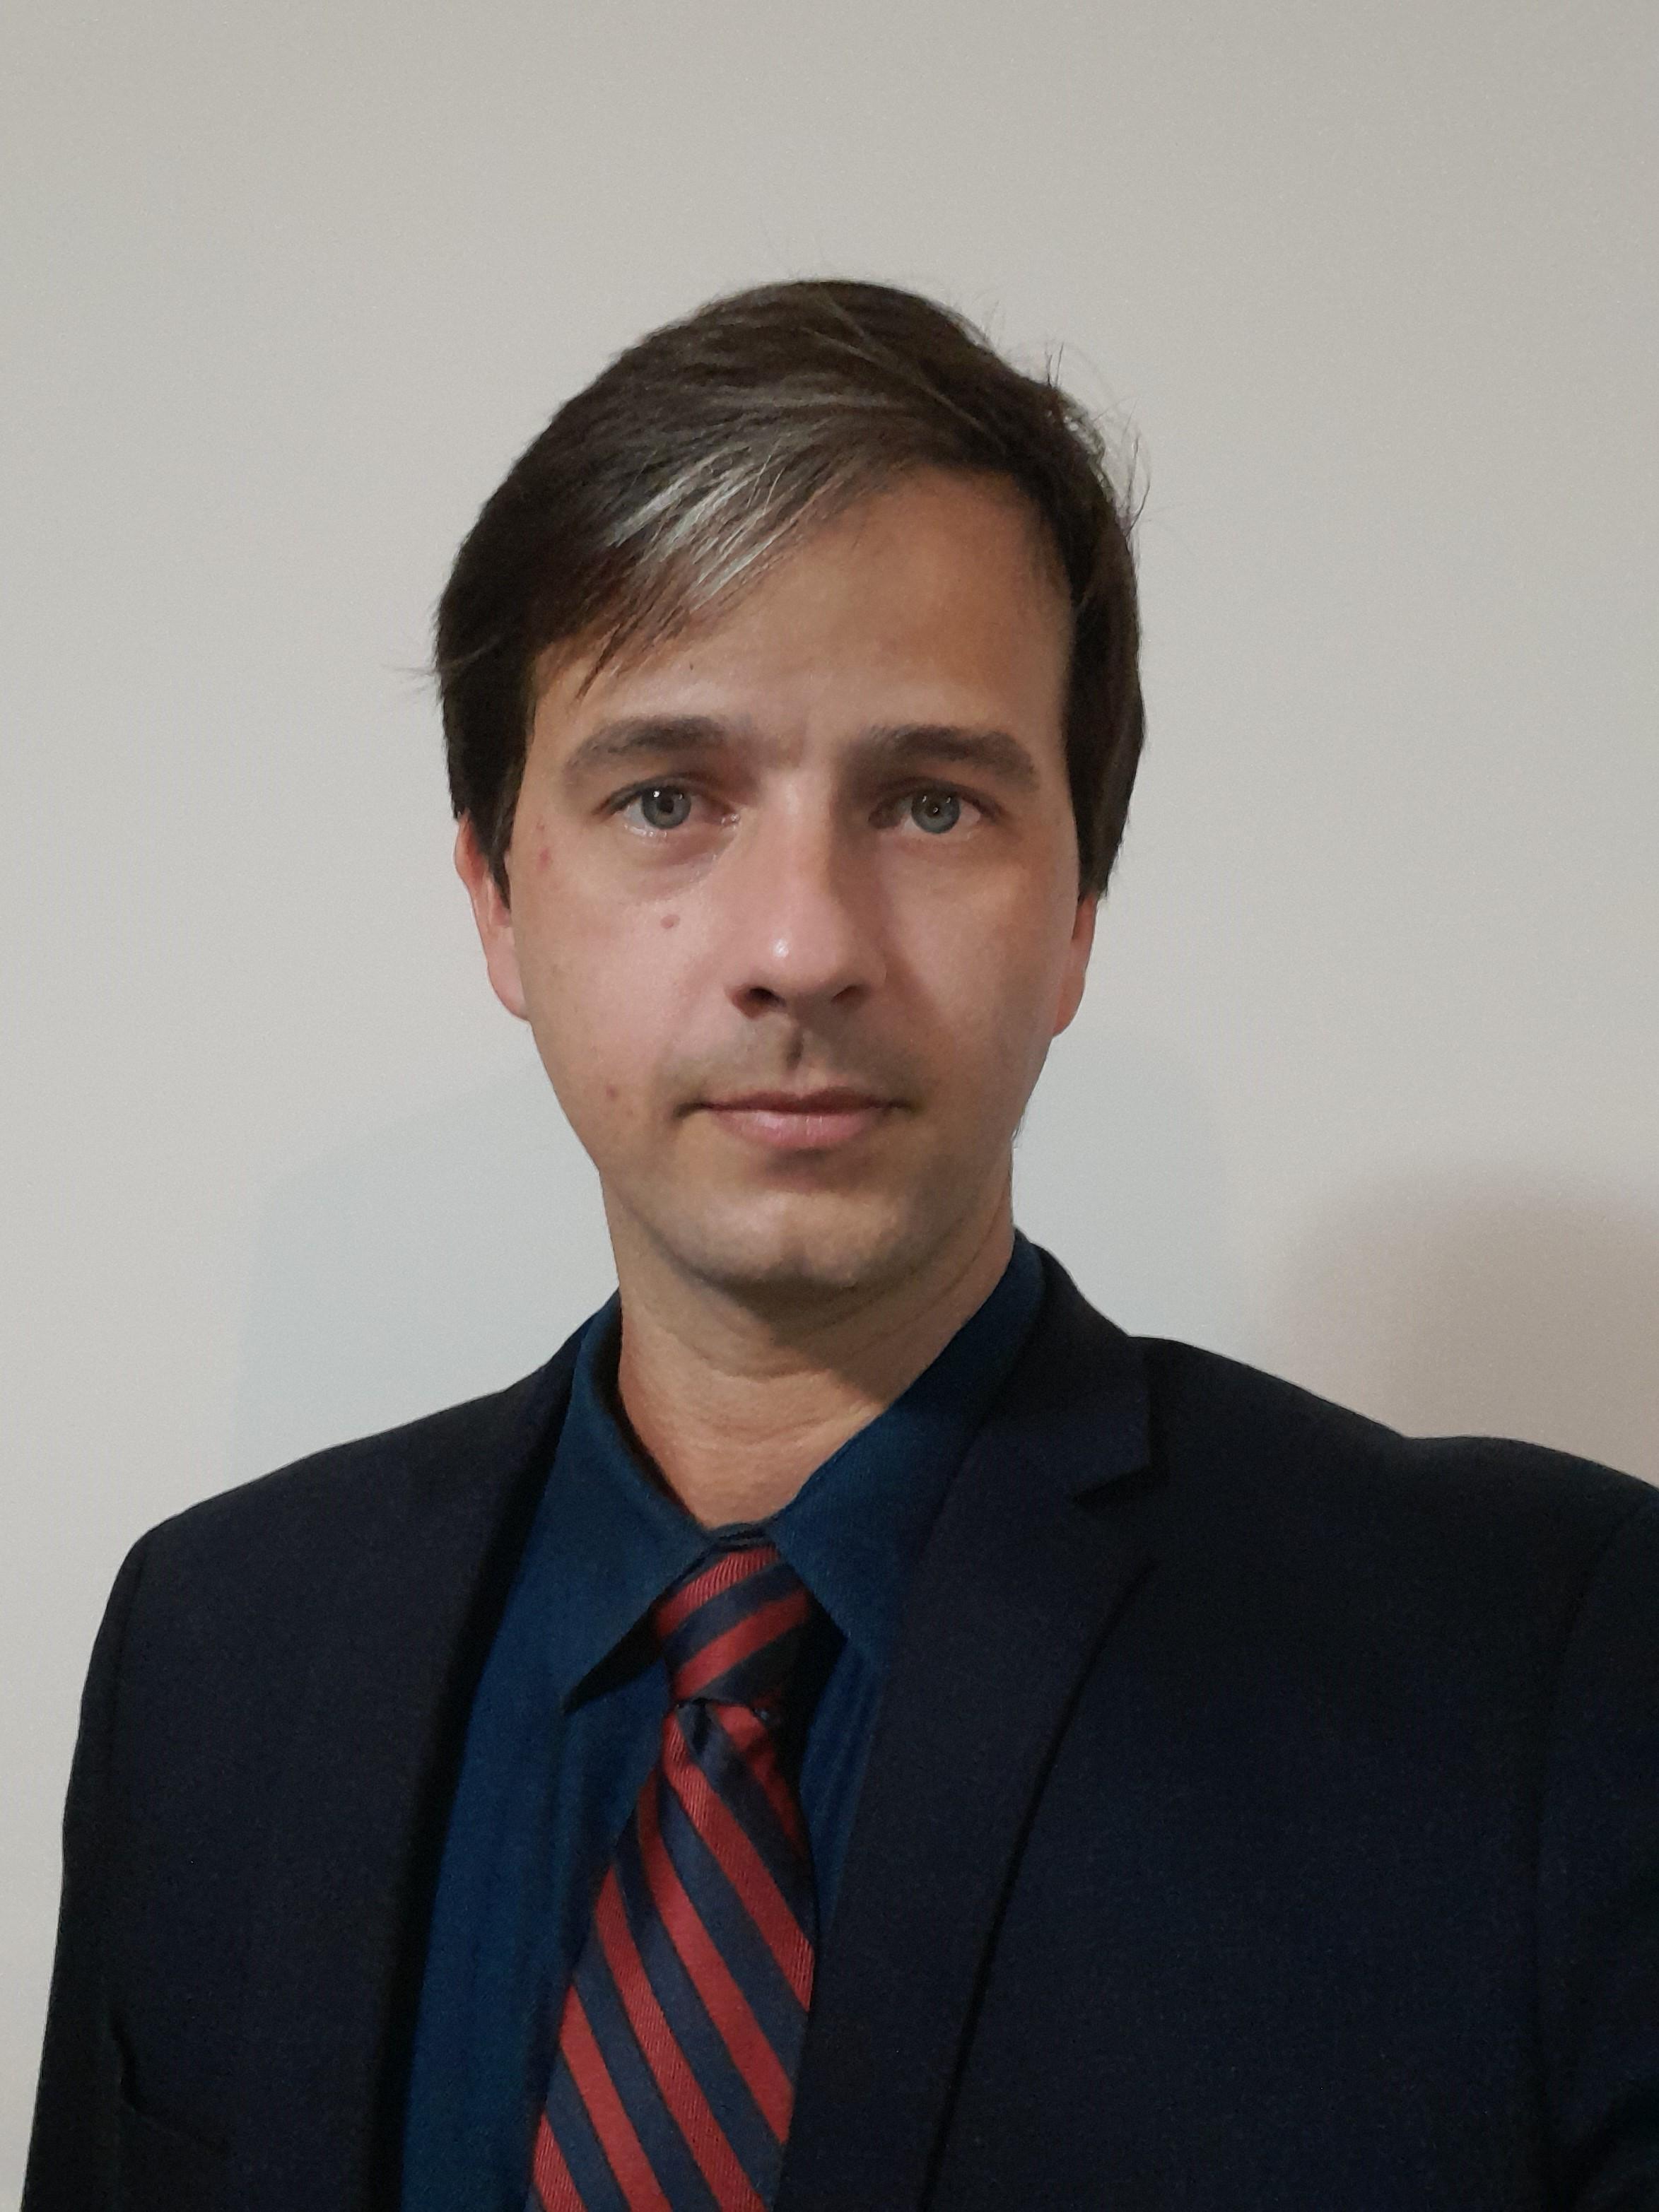 George Custódio